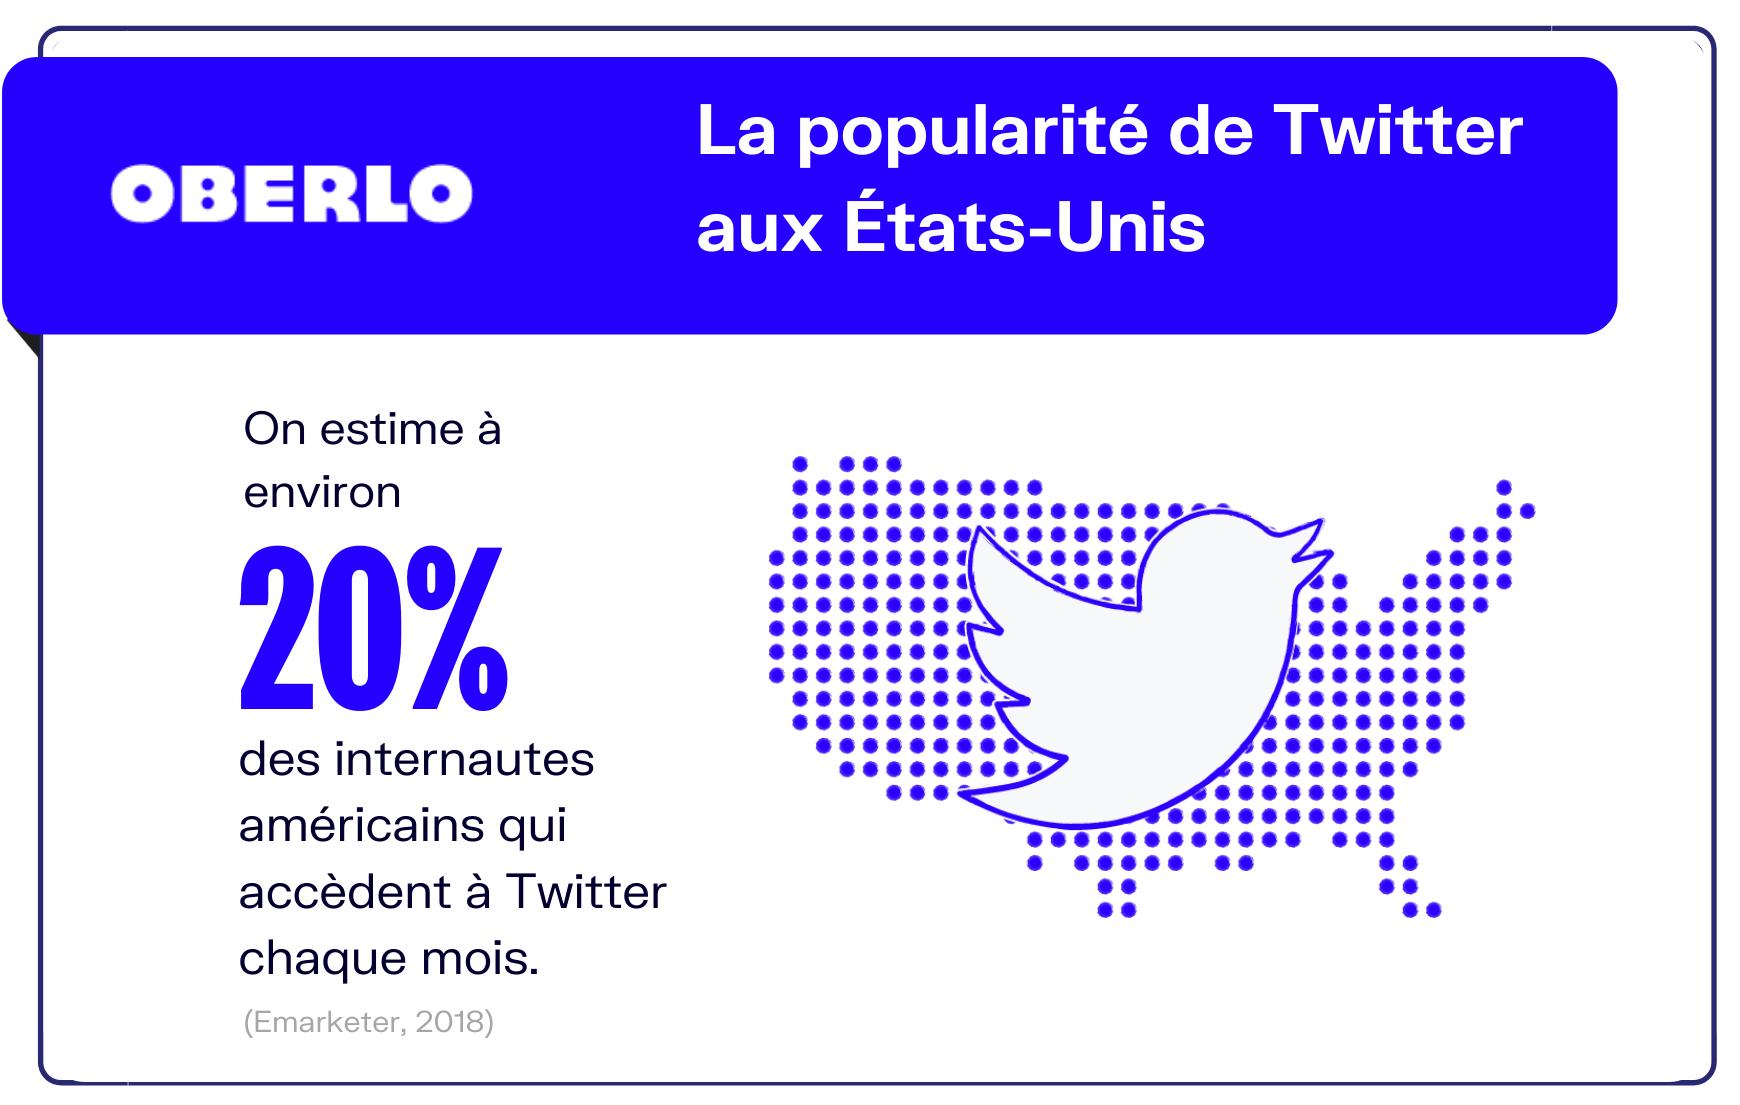 statistiques twitter etats unis